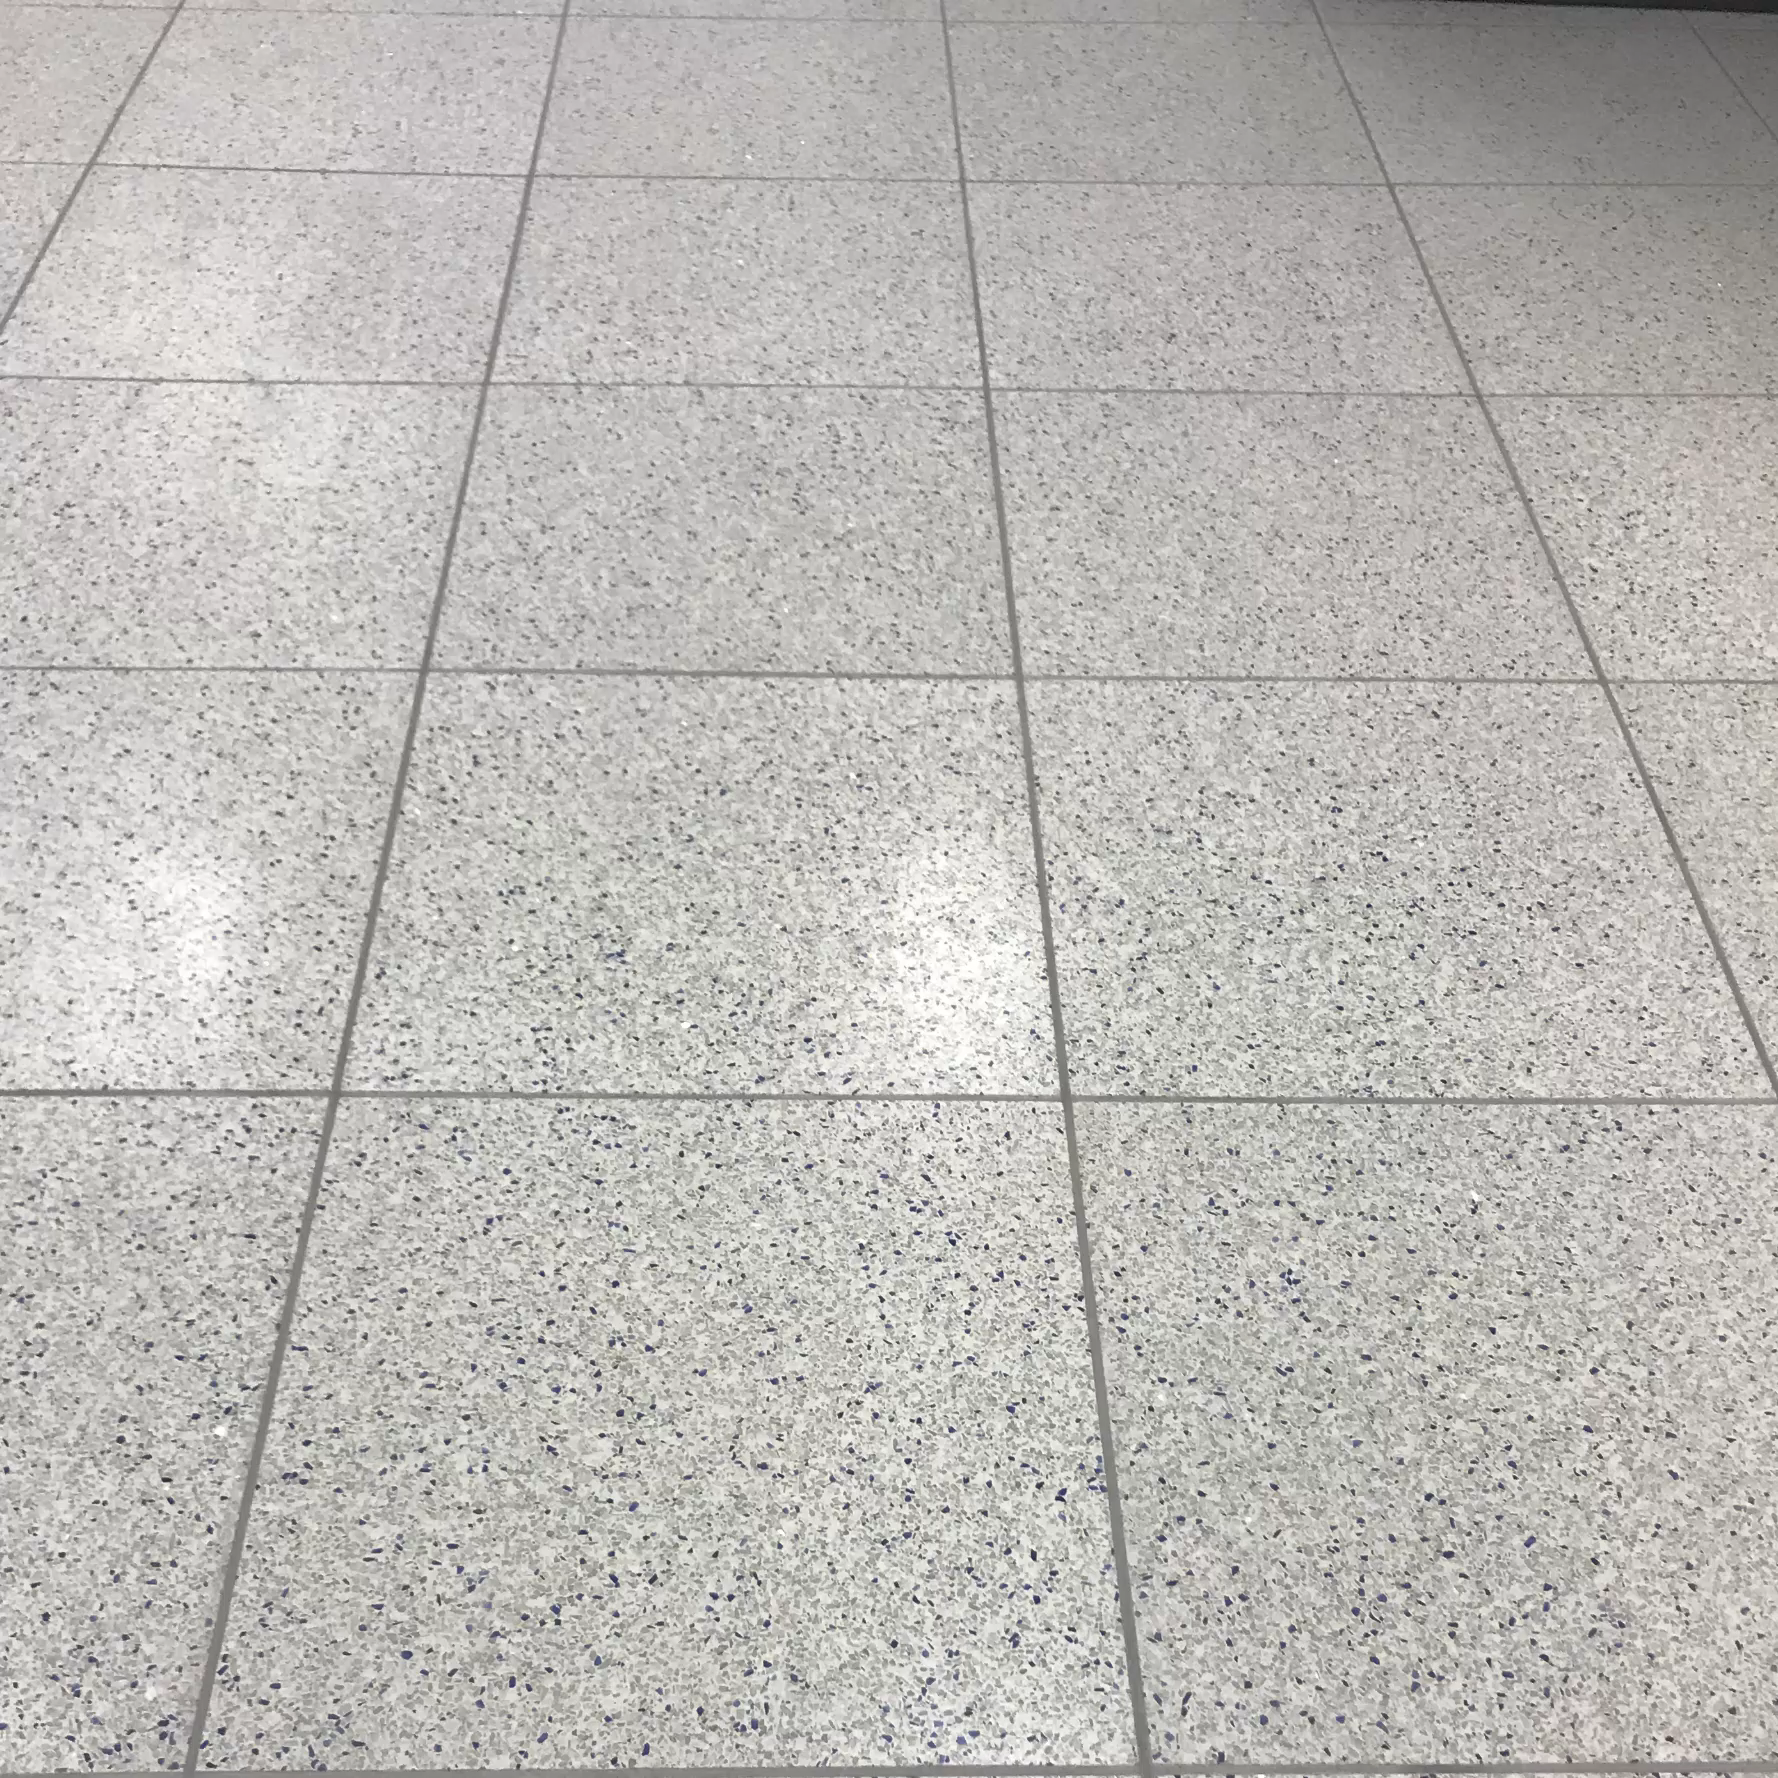 Watch Terrazzo Tiles Commercial Institutional Industrial Tile Installation Terrazzo Tile Tiles